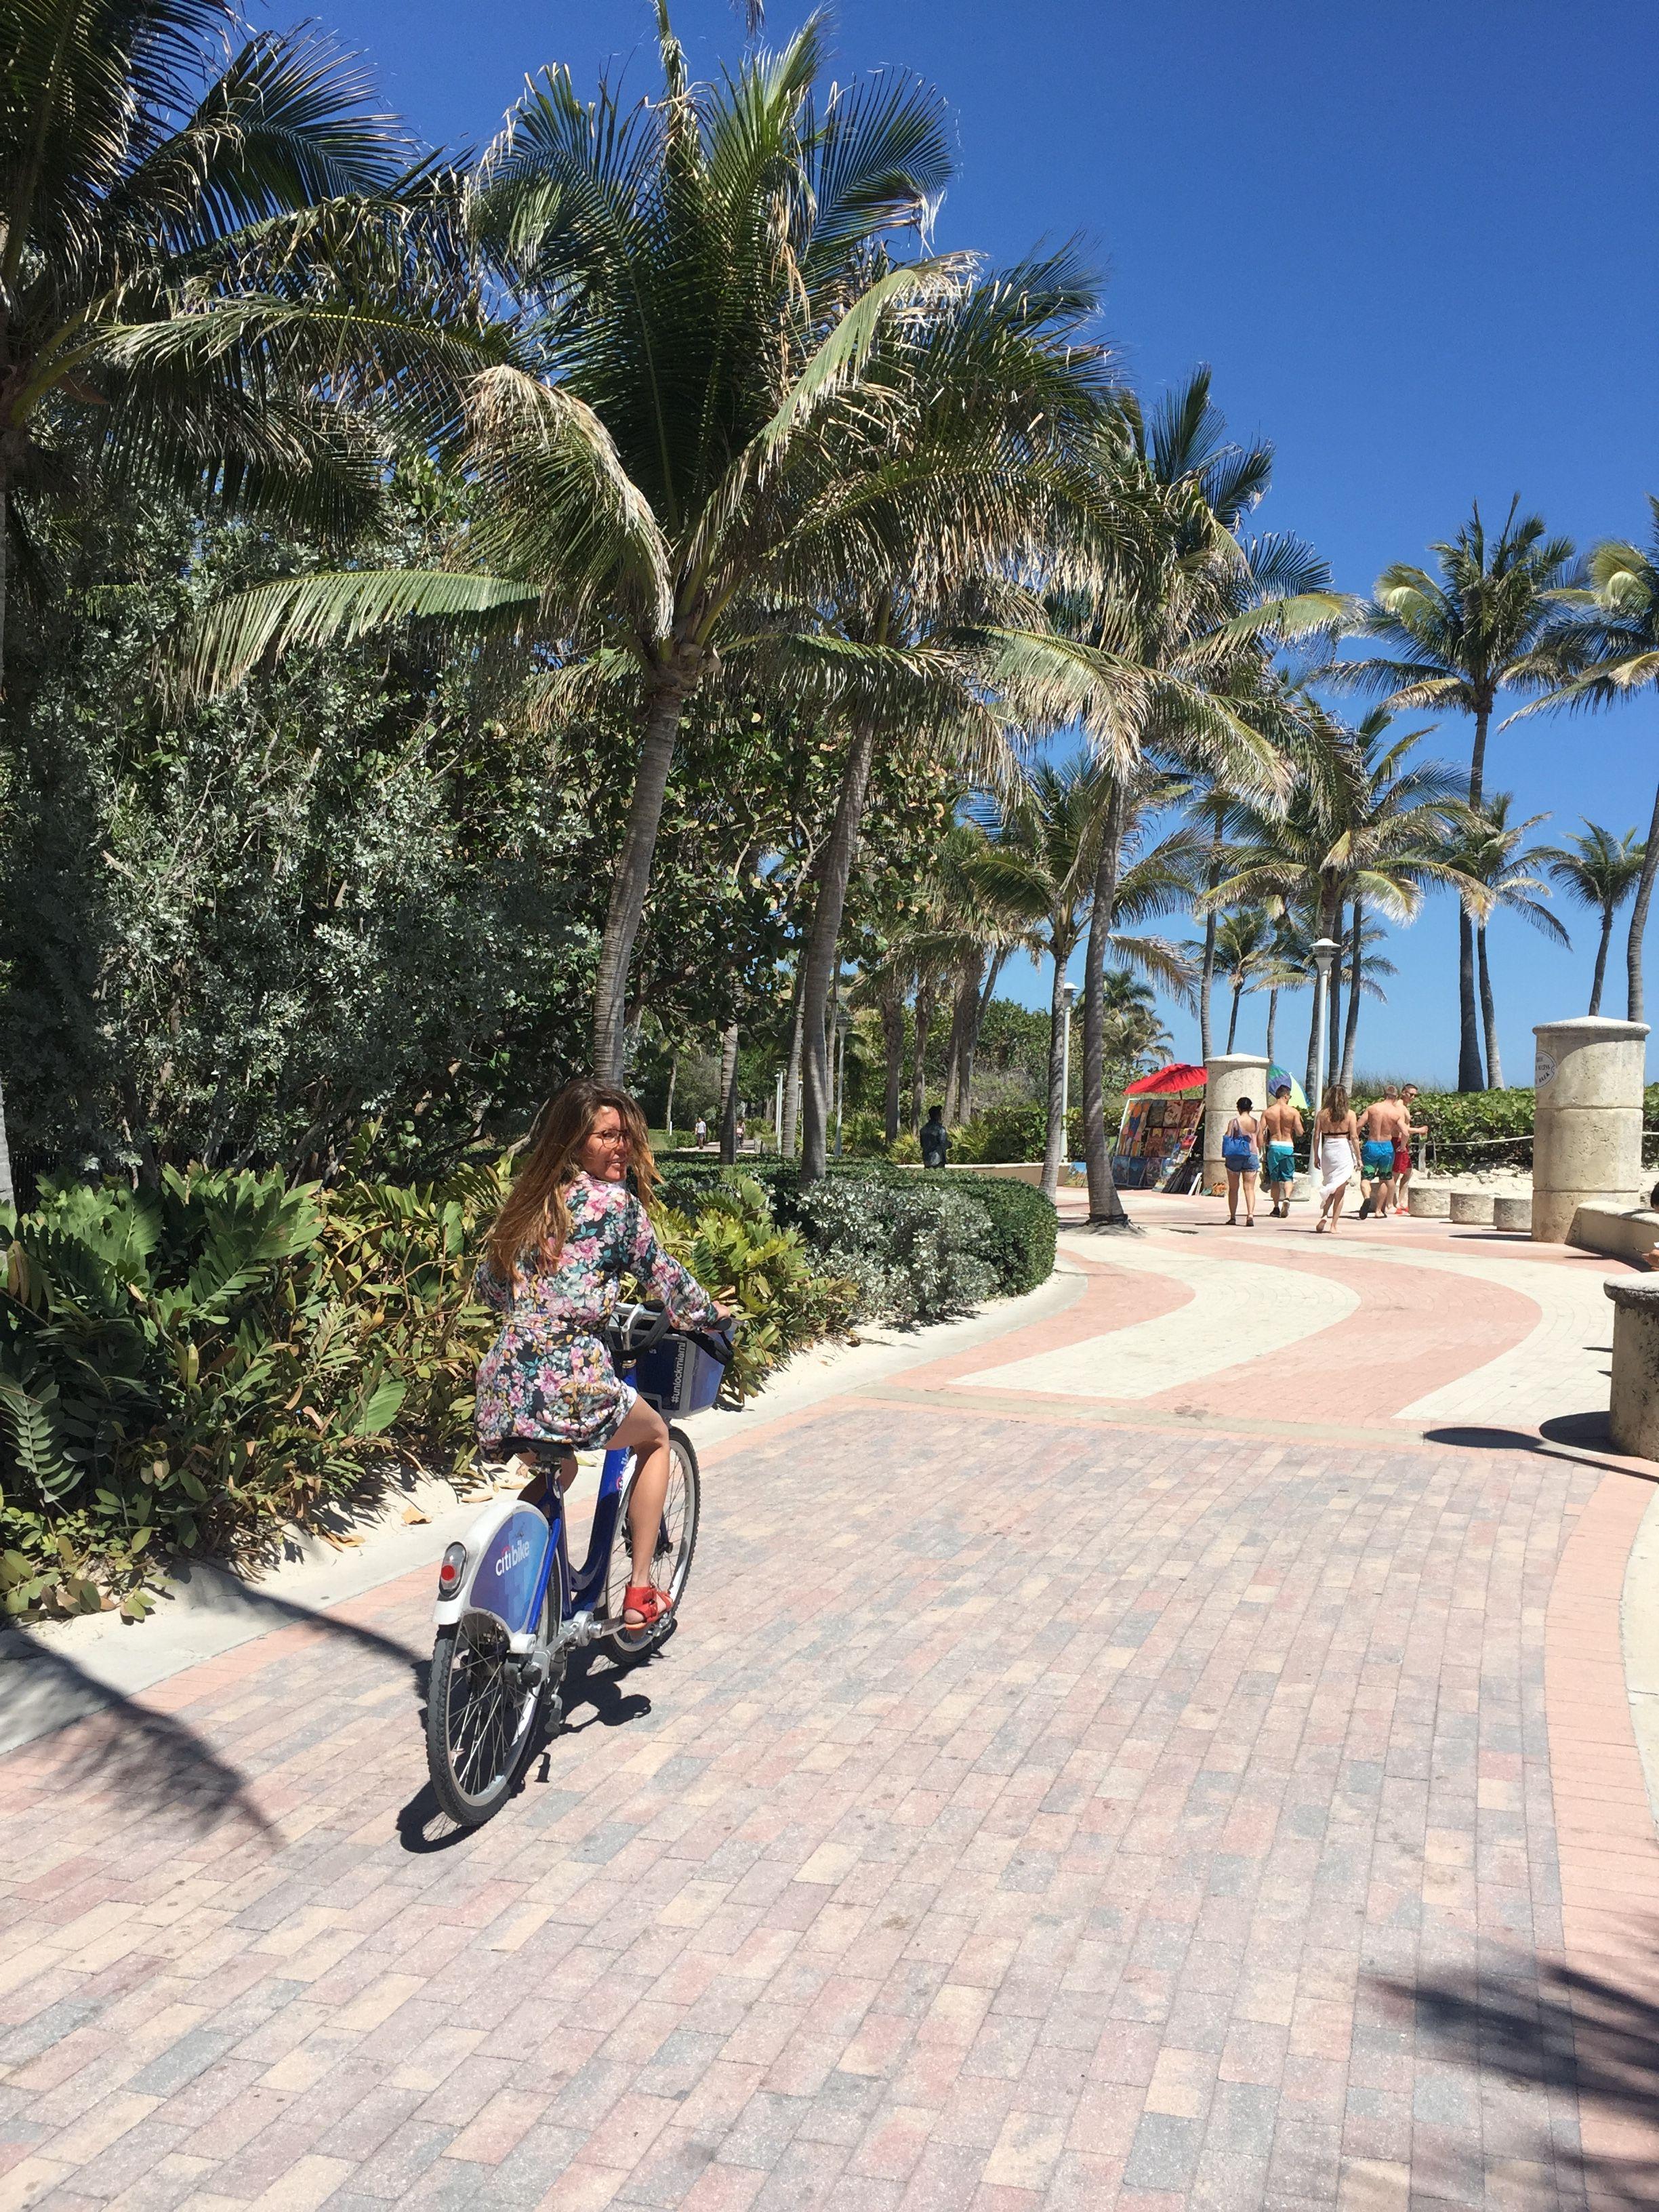 biking the miami beach boardwalk | beach boardwalk, beach